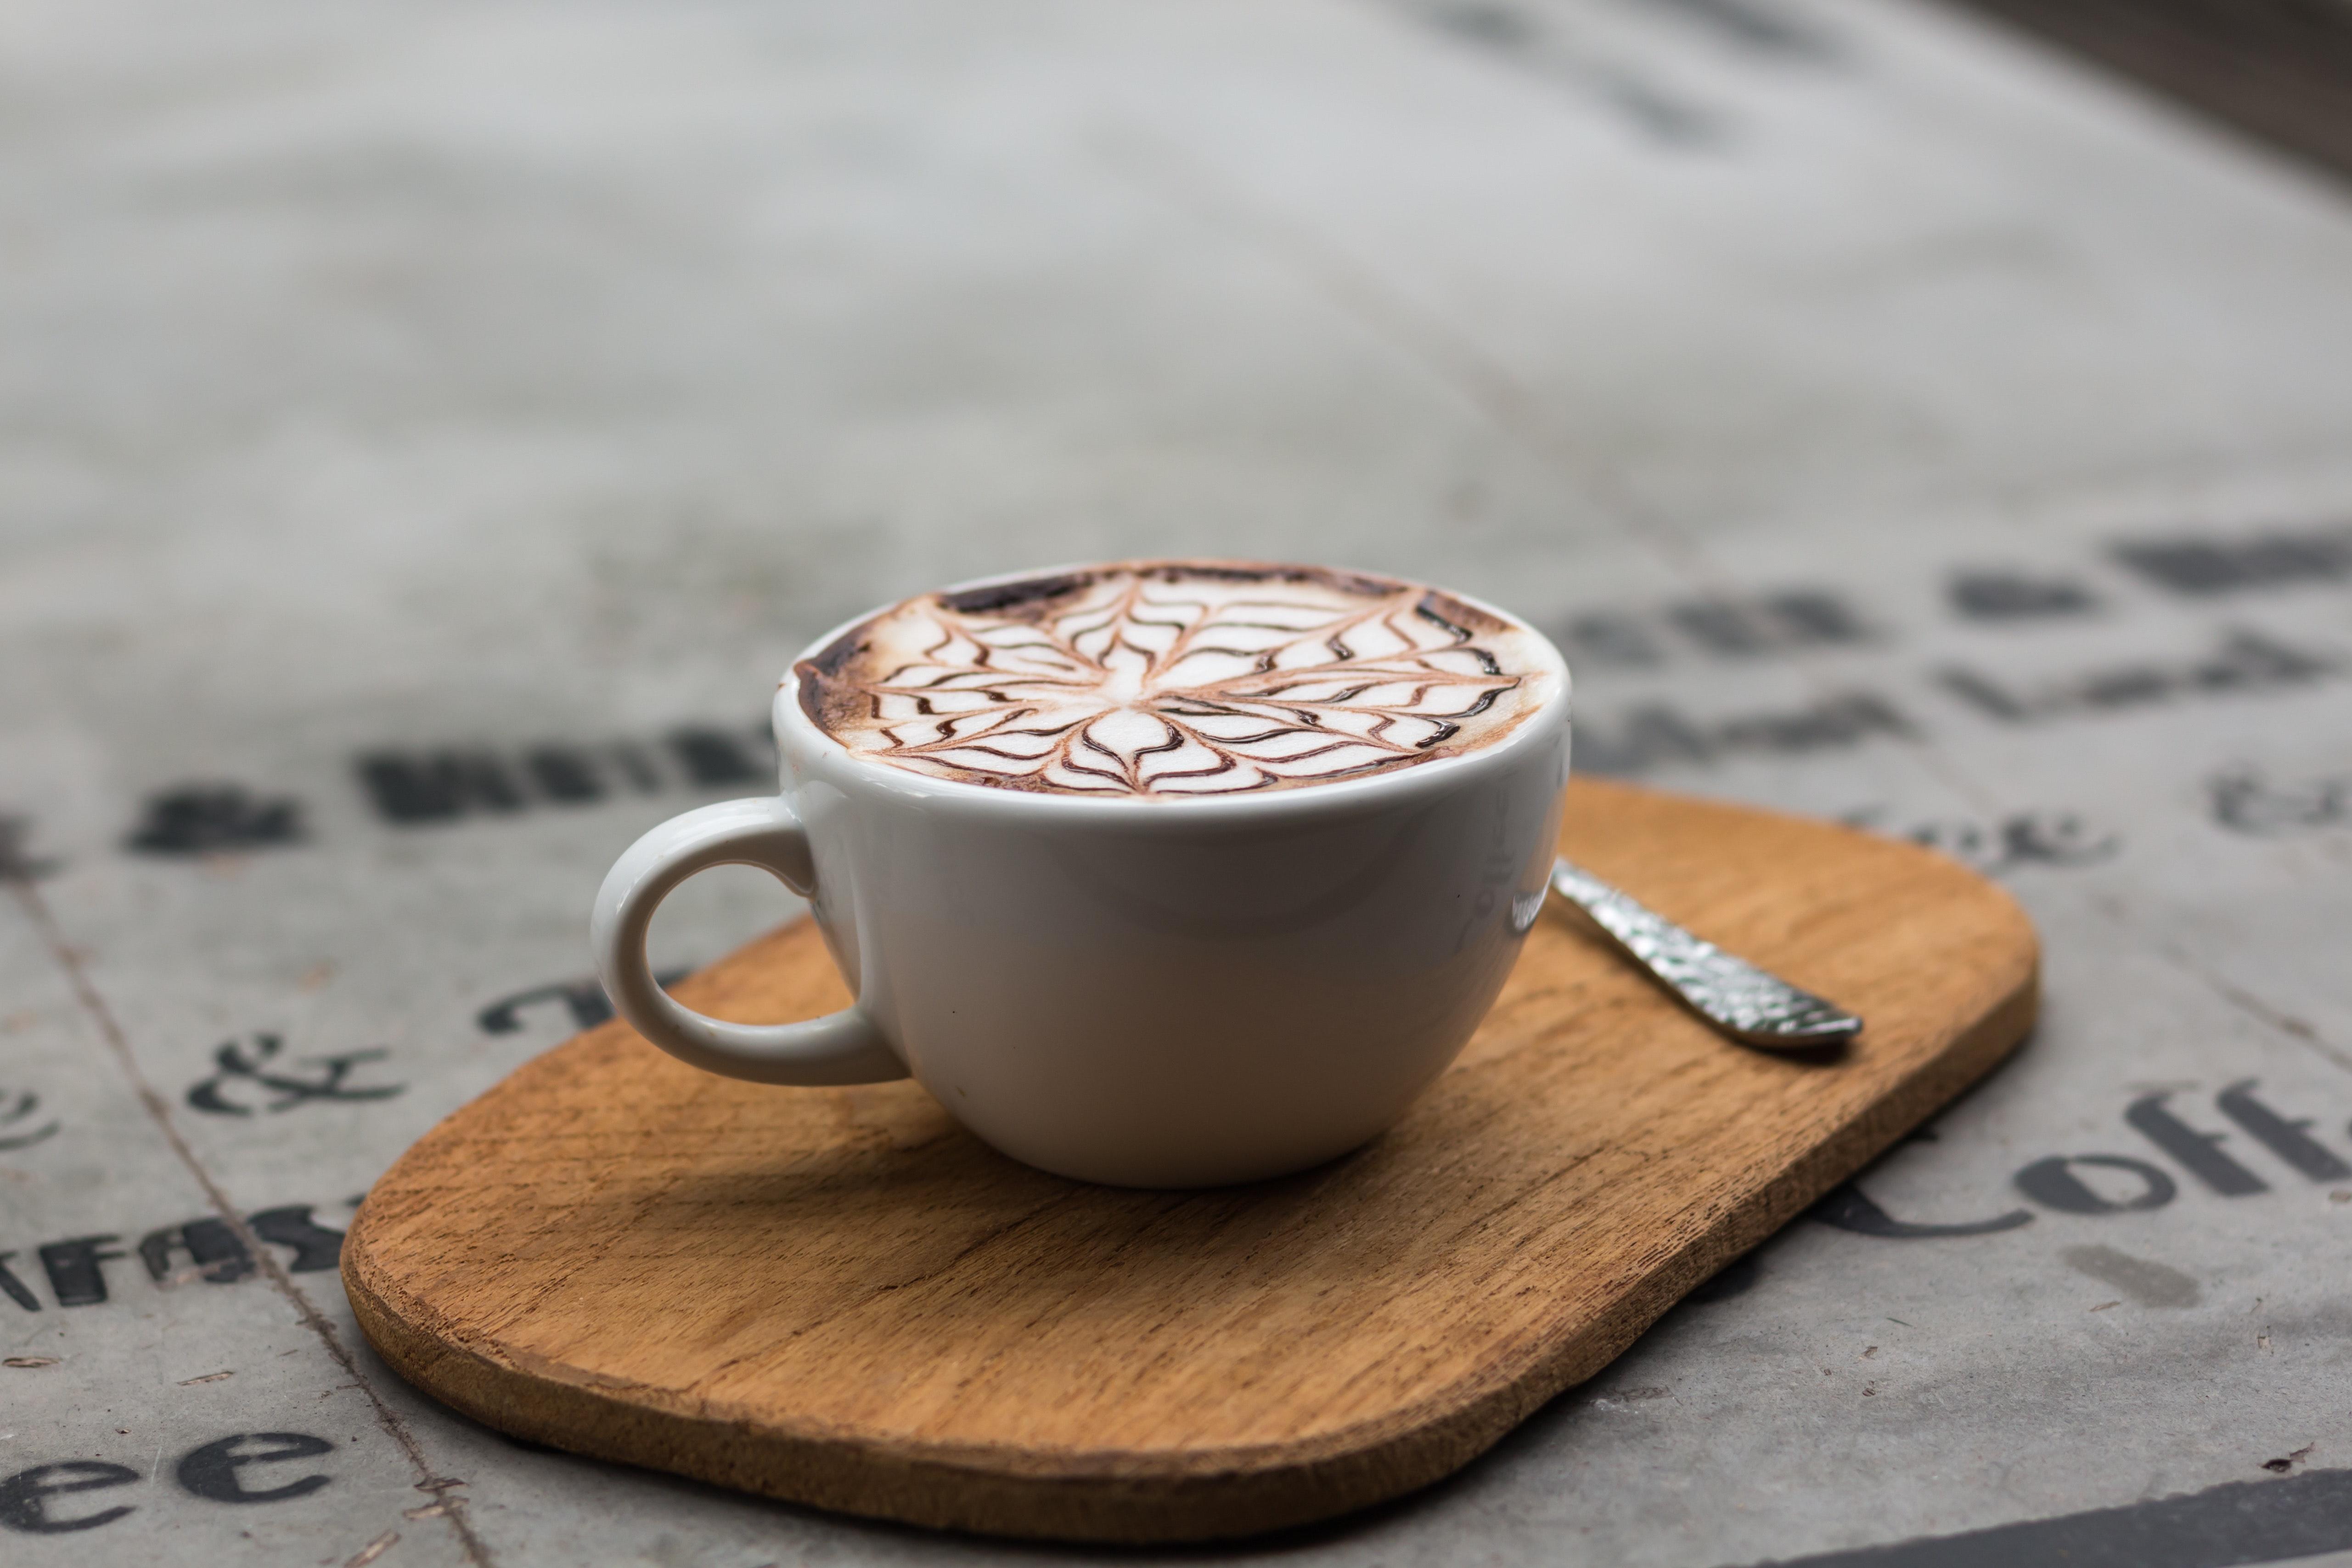 Cappuccino in ceramic teacup beside teaspoon photo